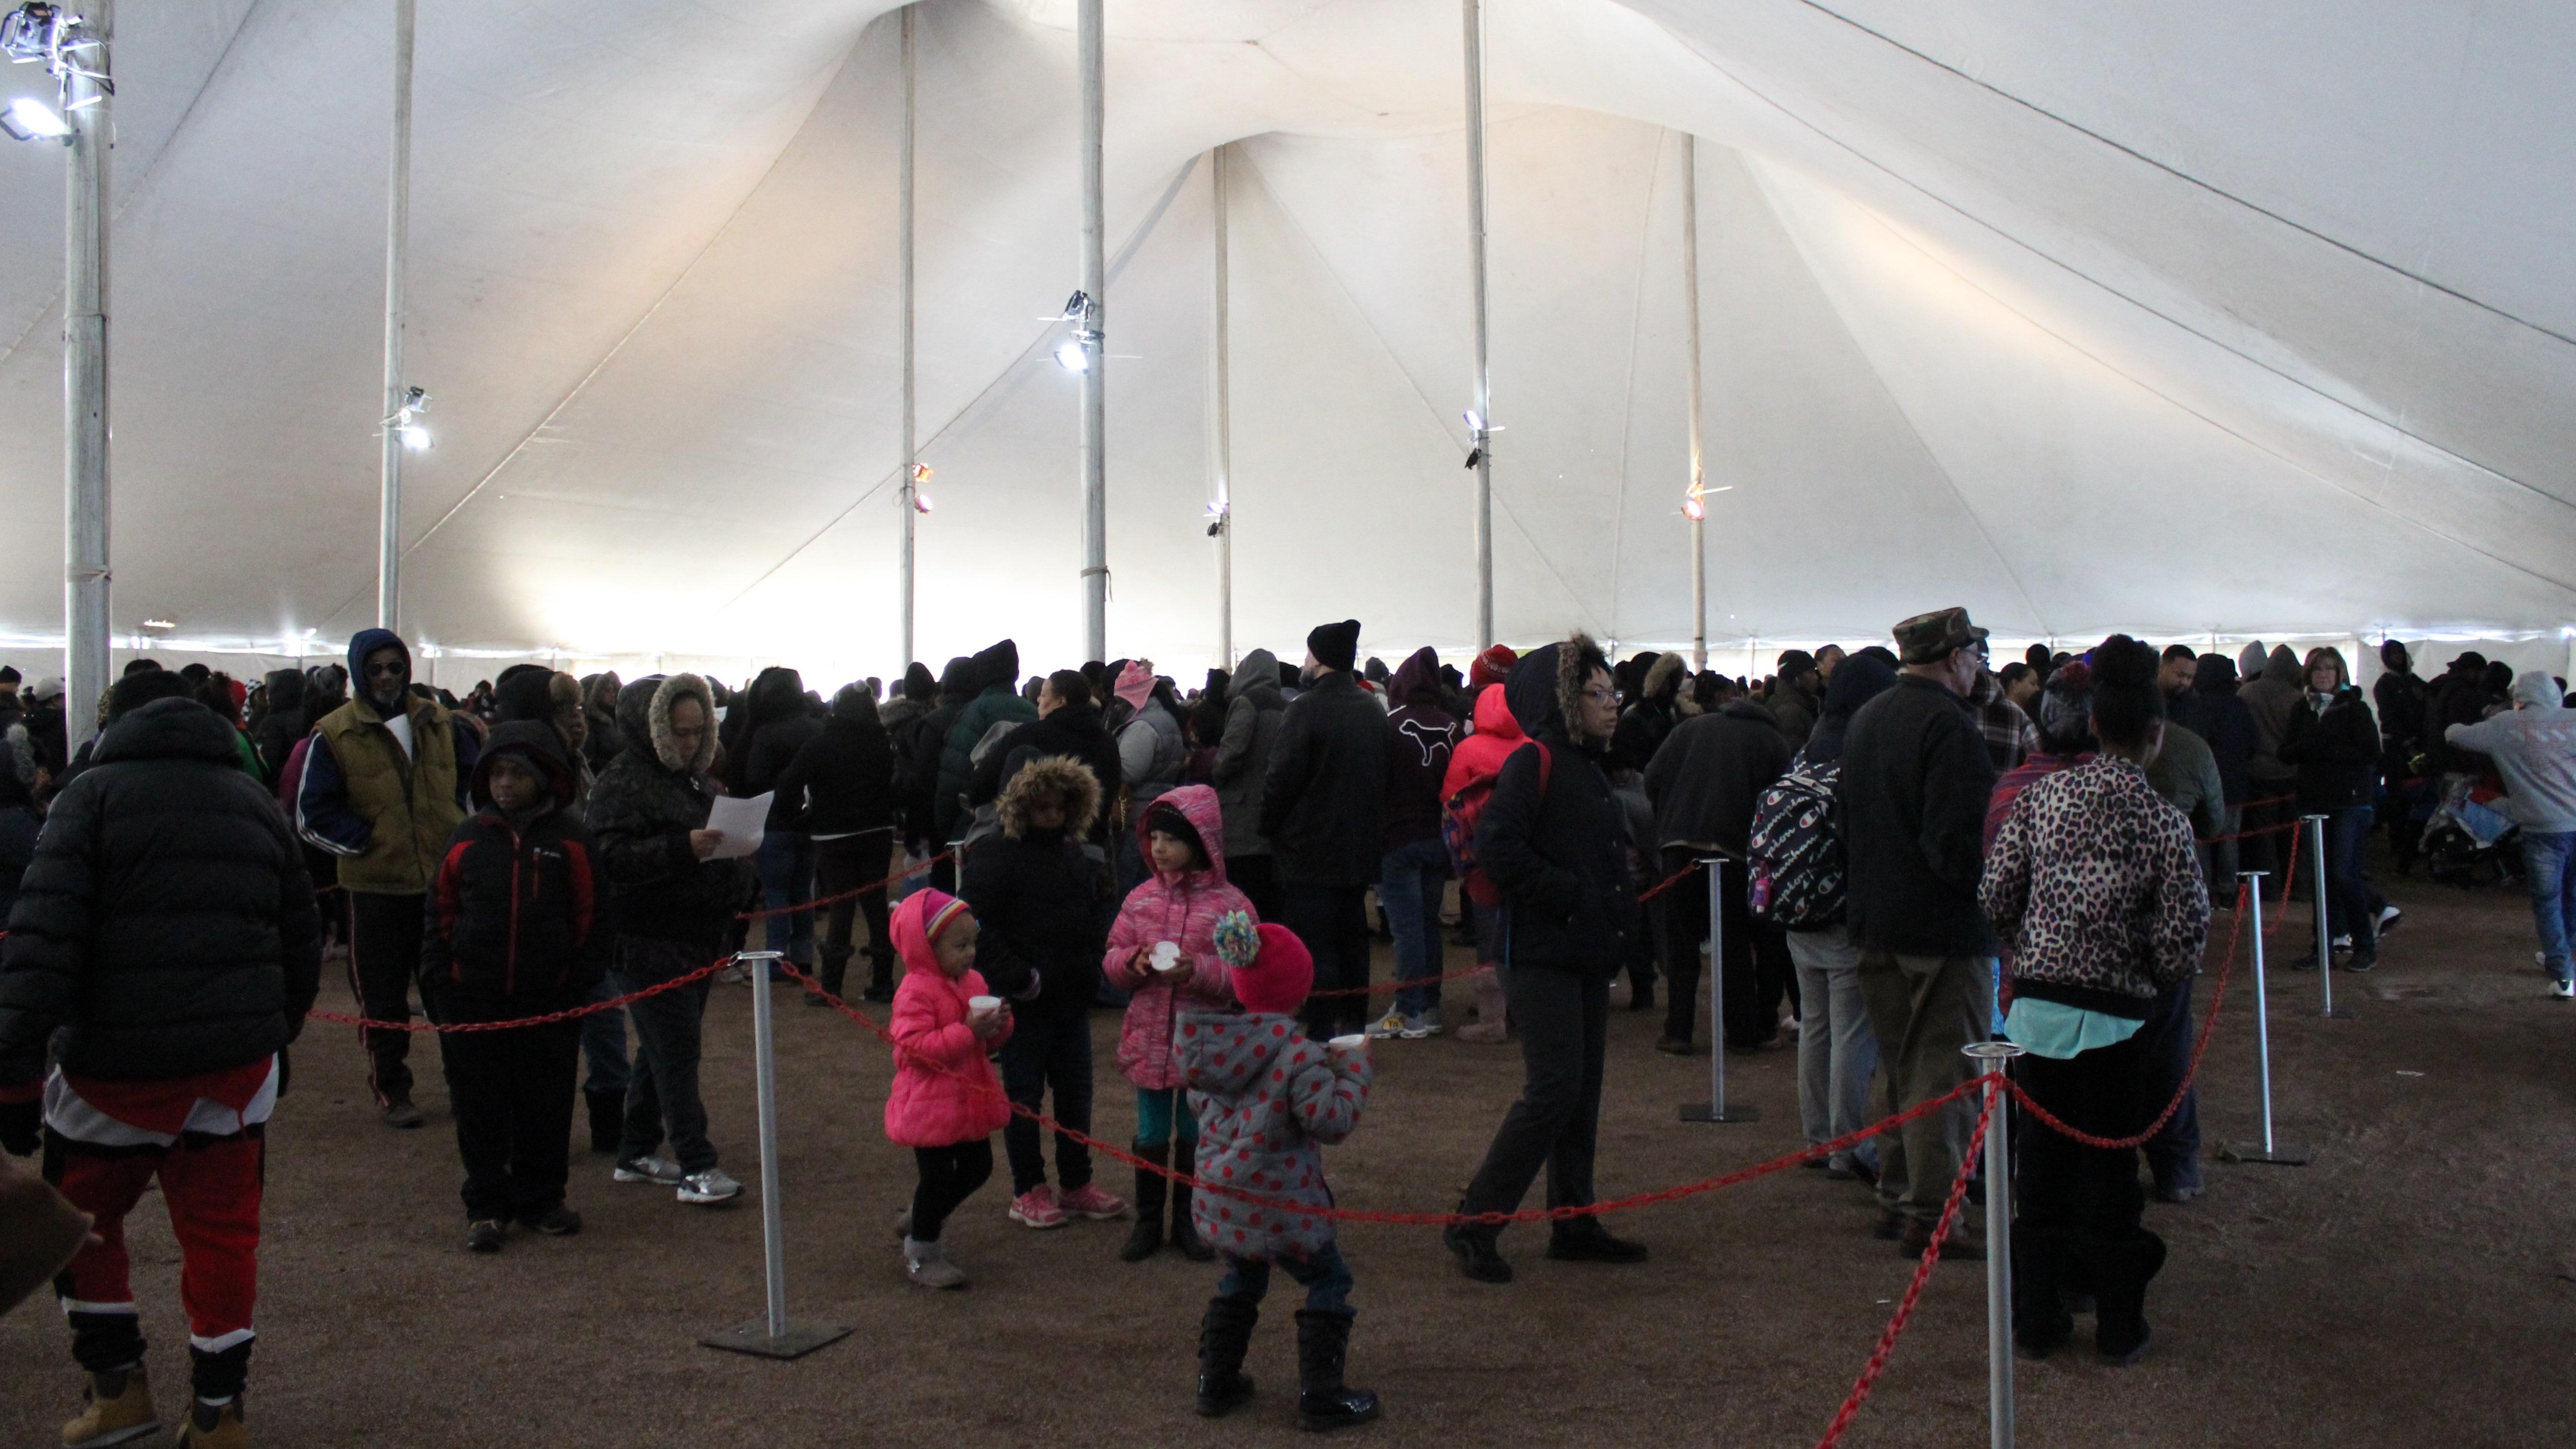 100x150 Pole Tent